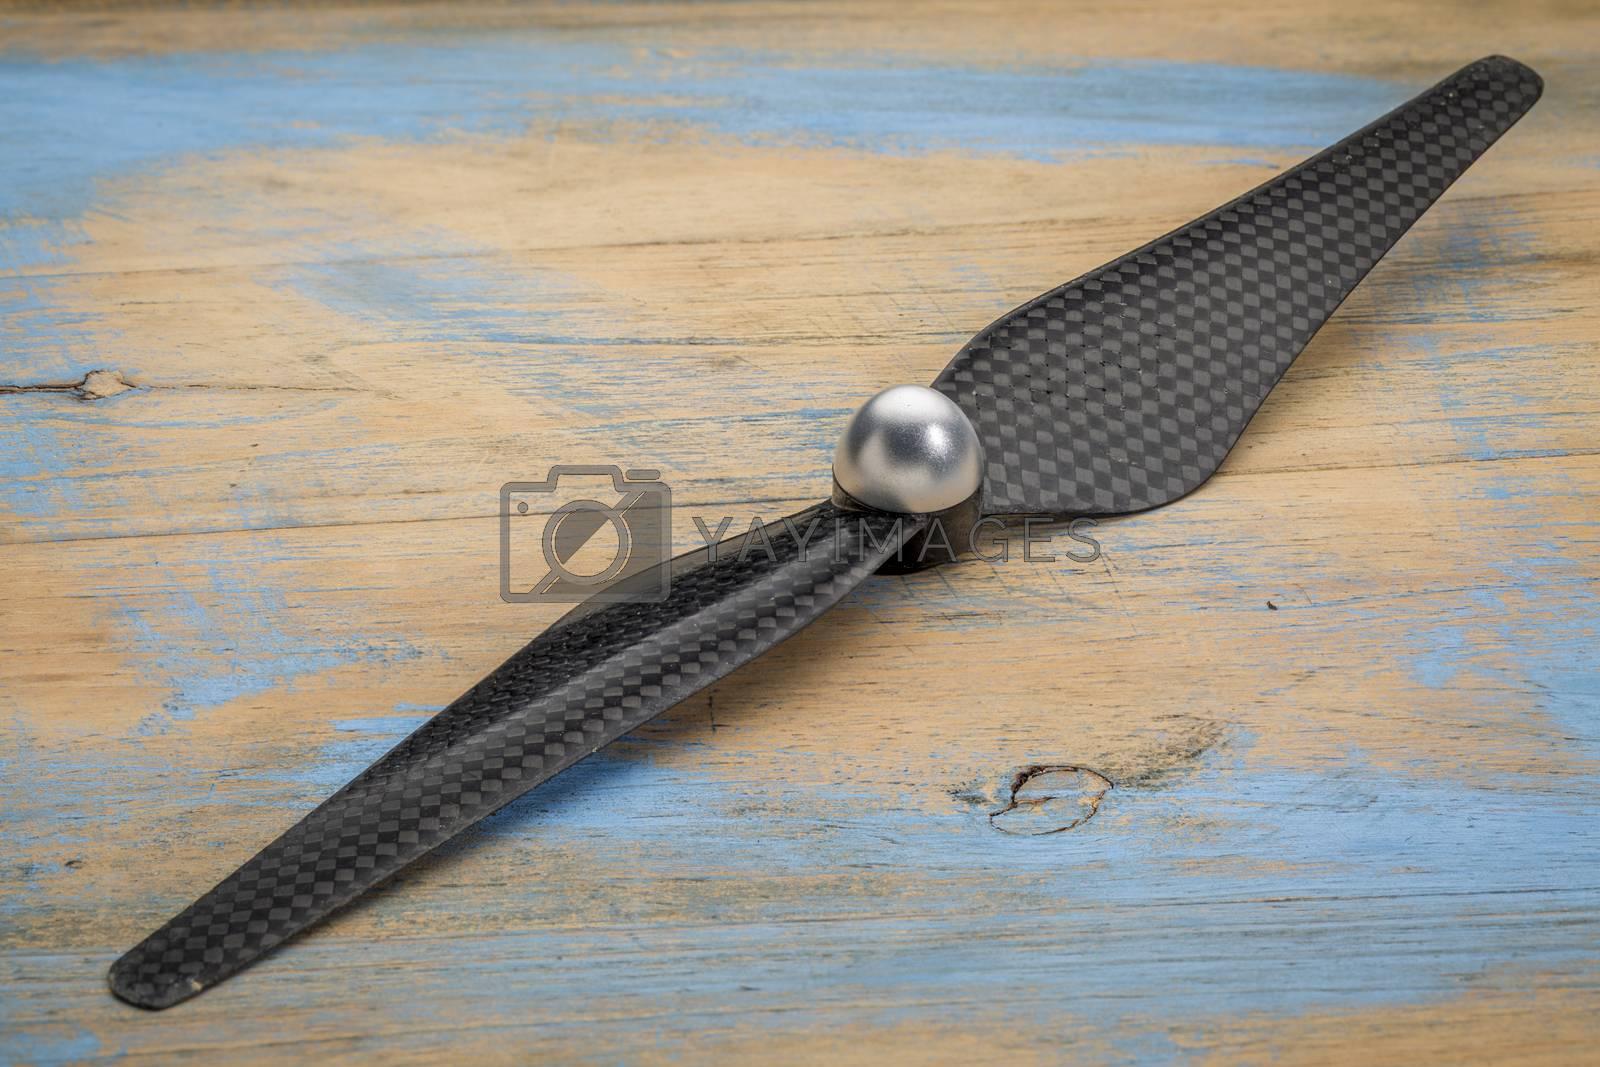 carbon fiber drone propeller by PixelsAway